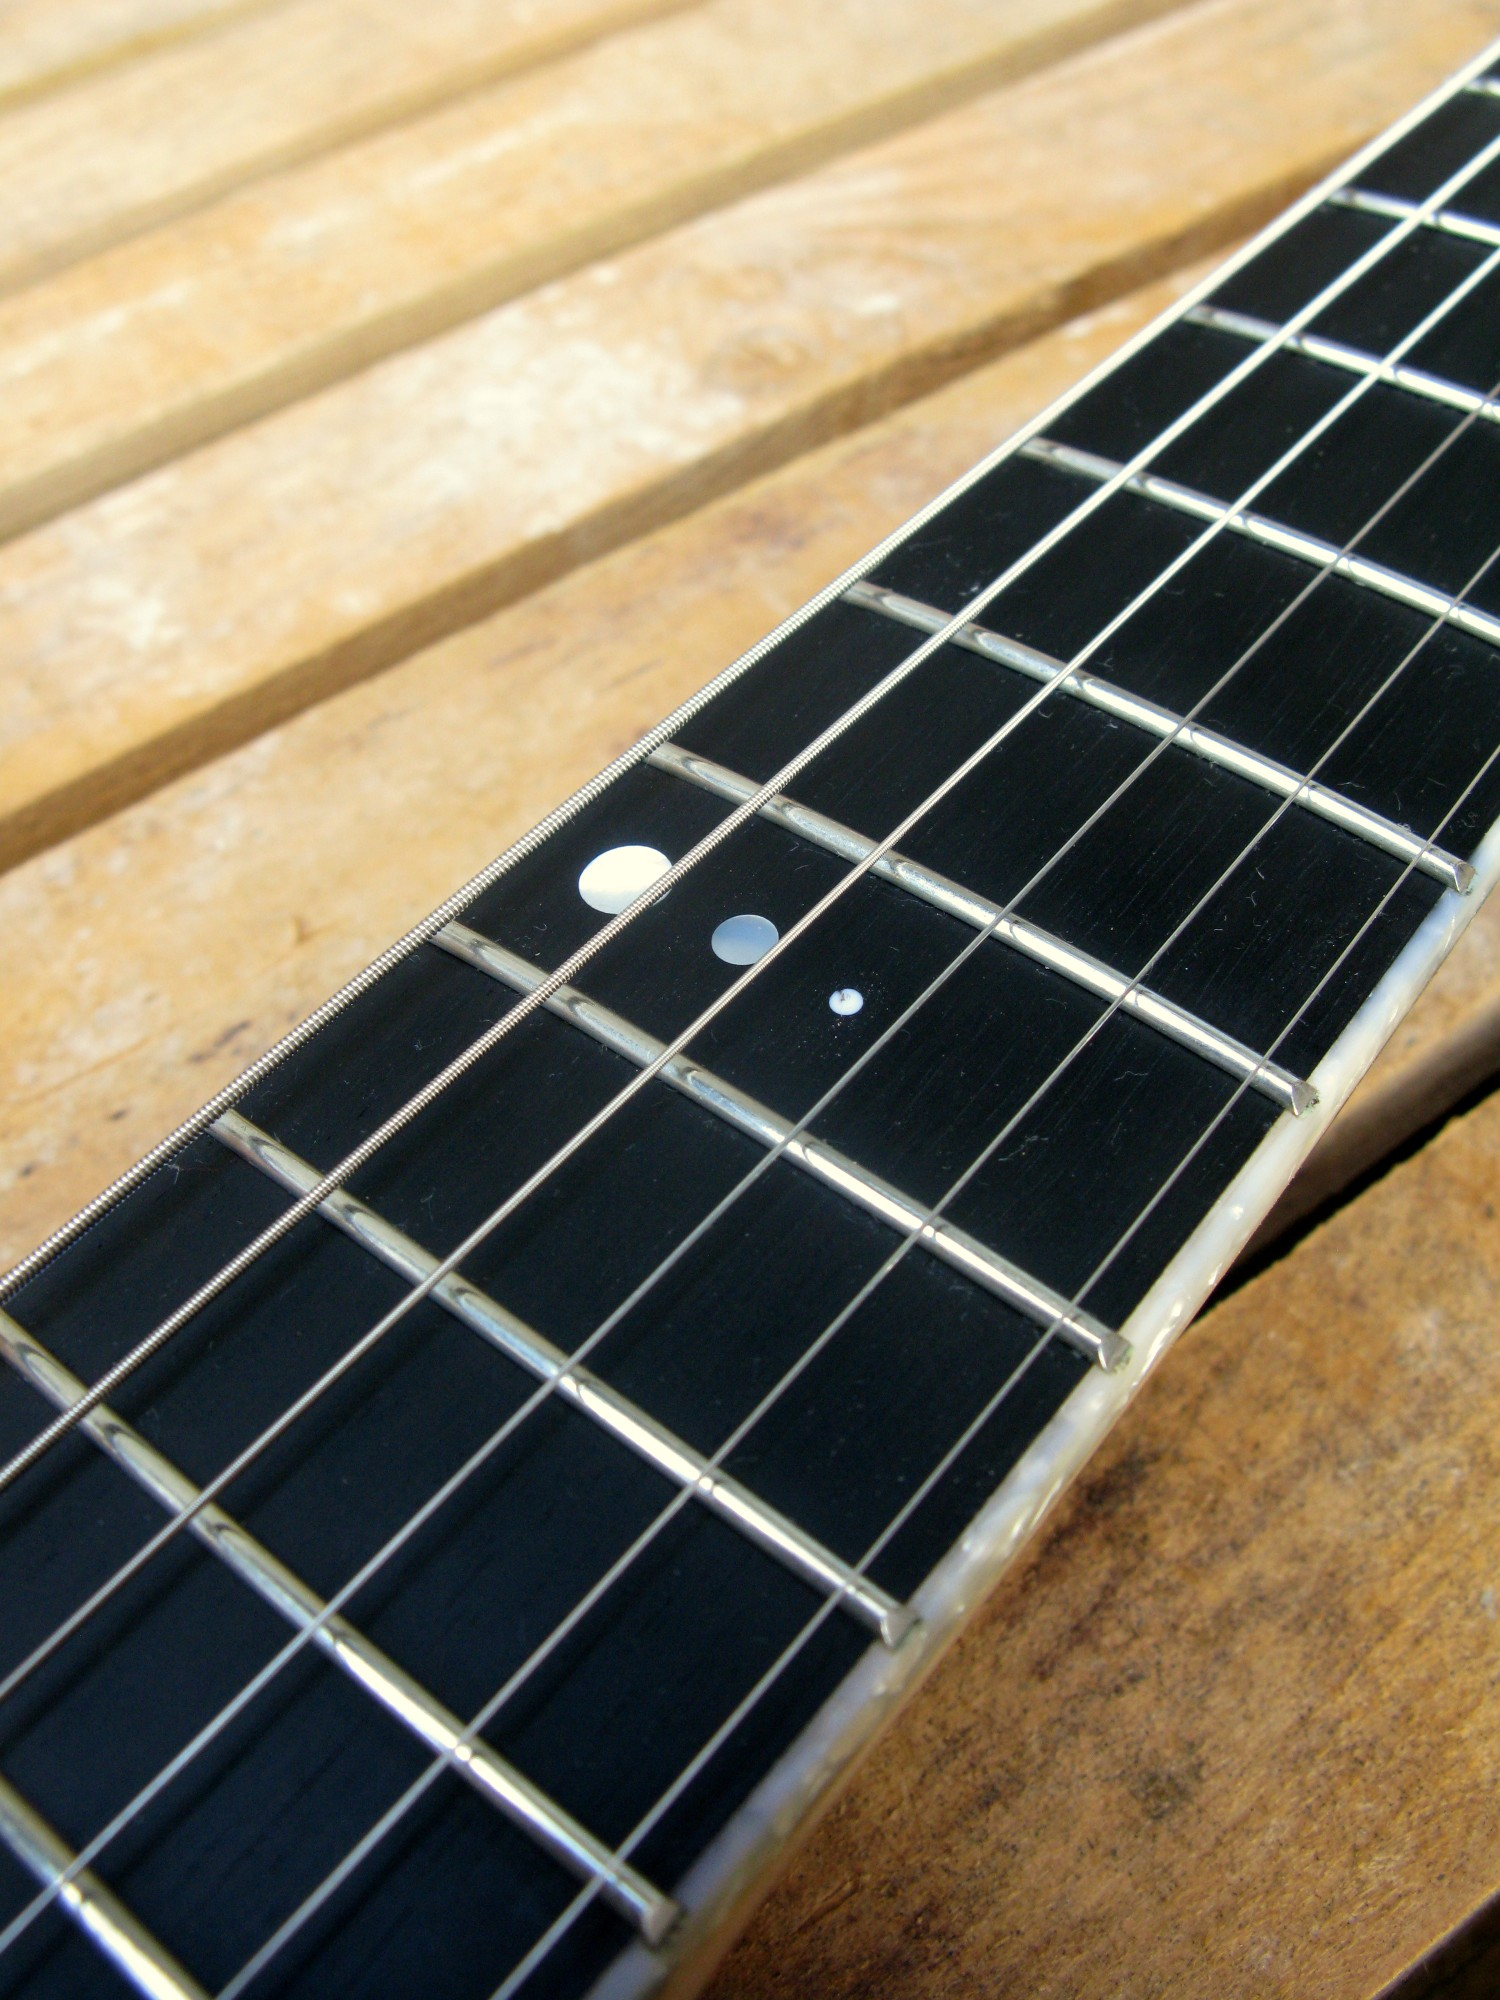 Chitarra telecaster in pioppo tastiera ebano